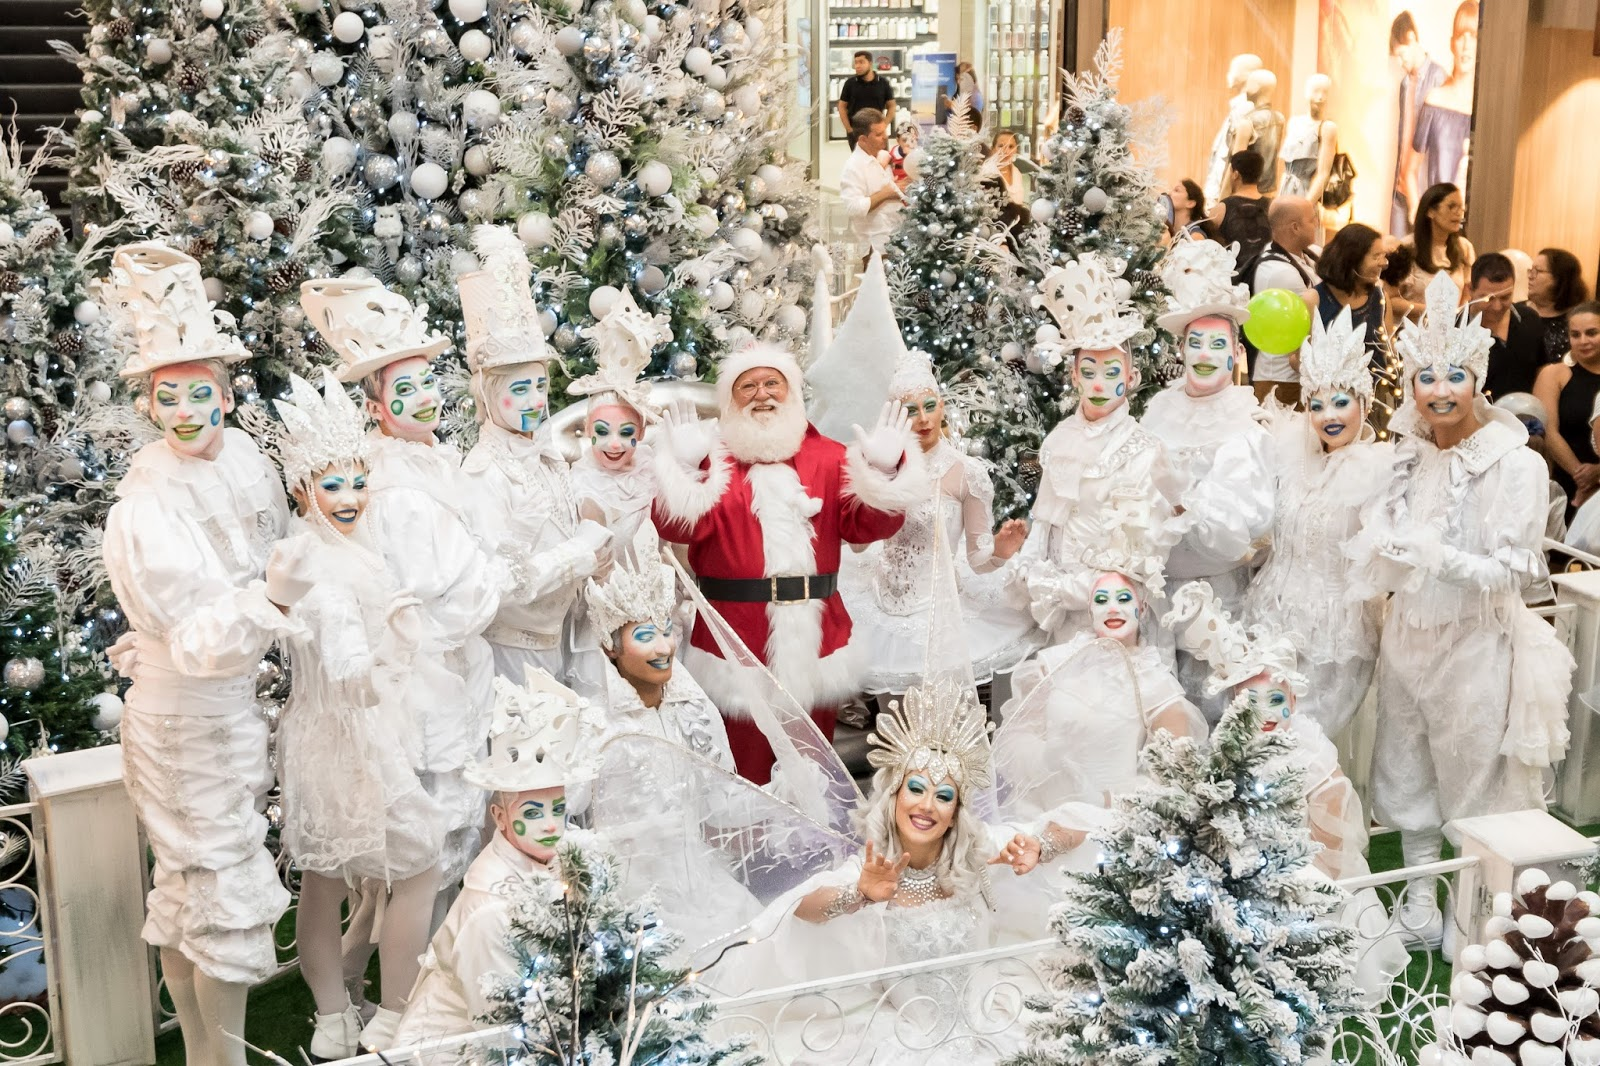 Tocata de Natal no Brasília Shopping